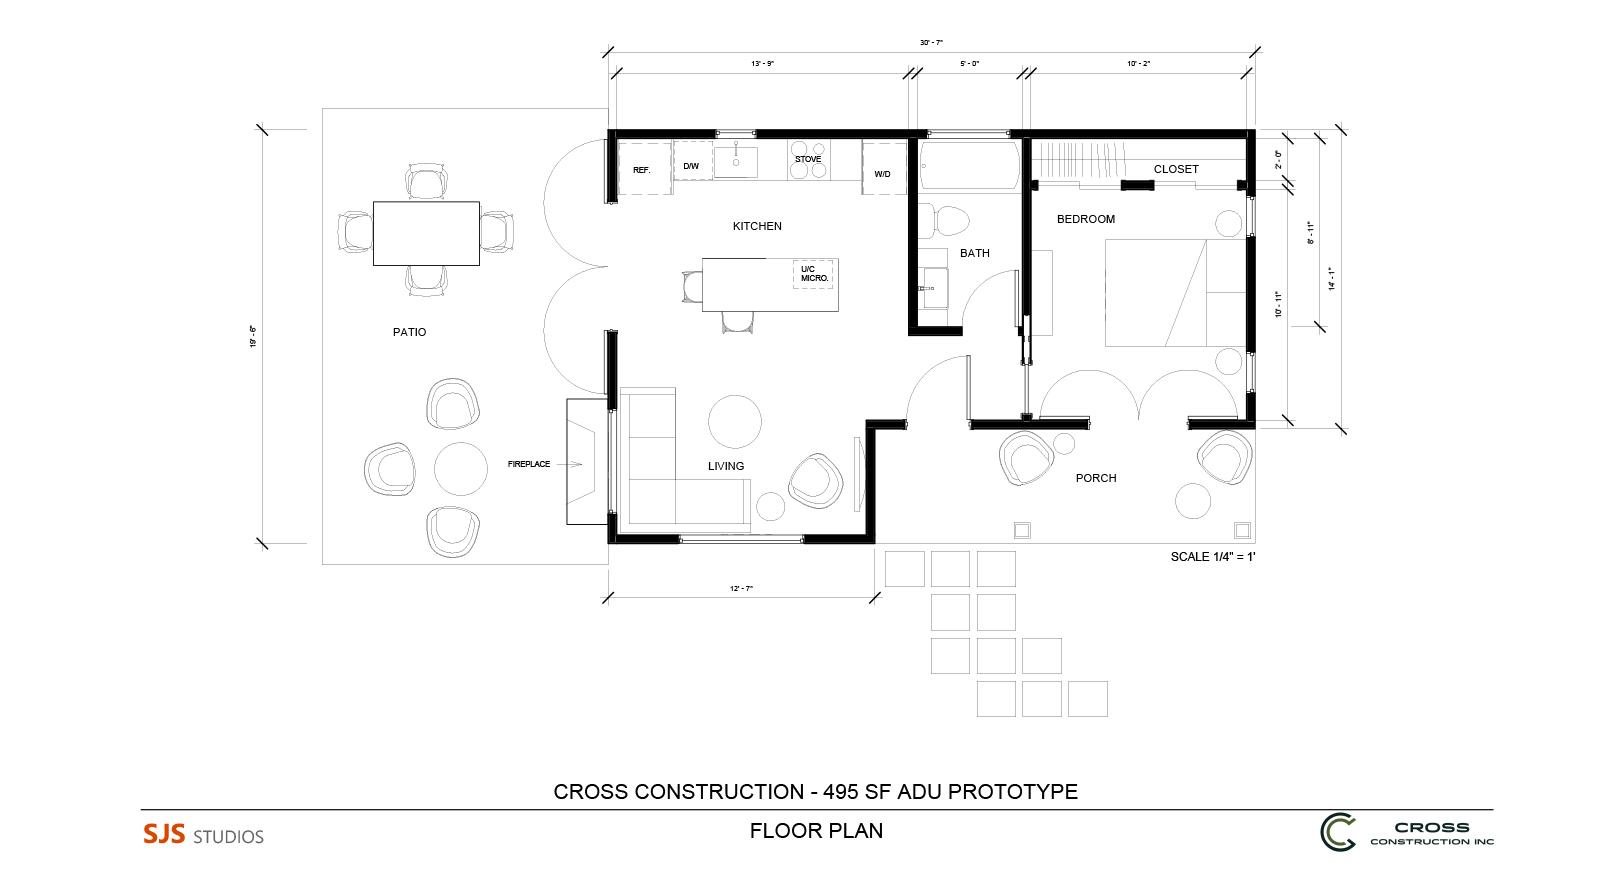 CROSS 495 ADU floor plan_resized